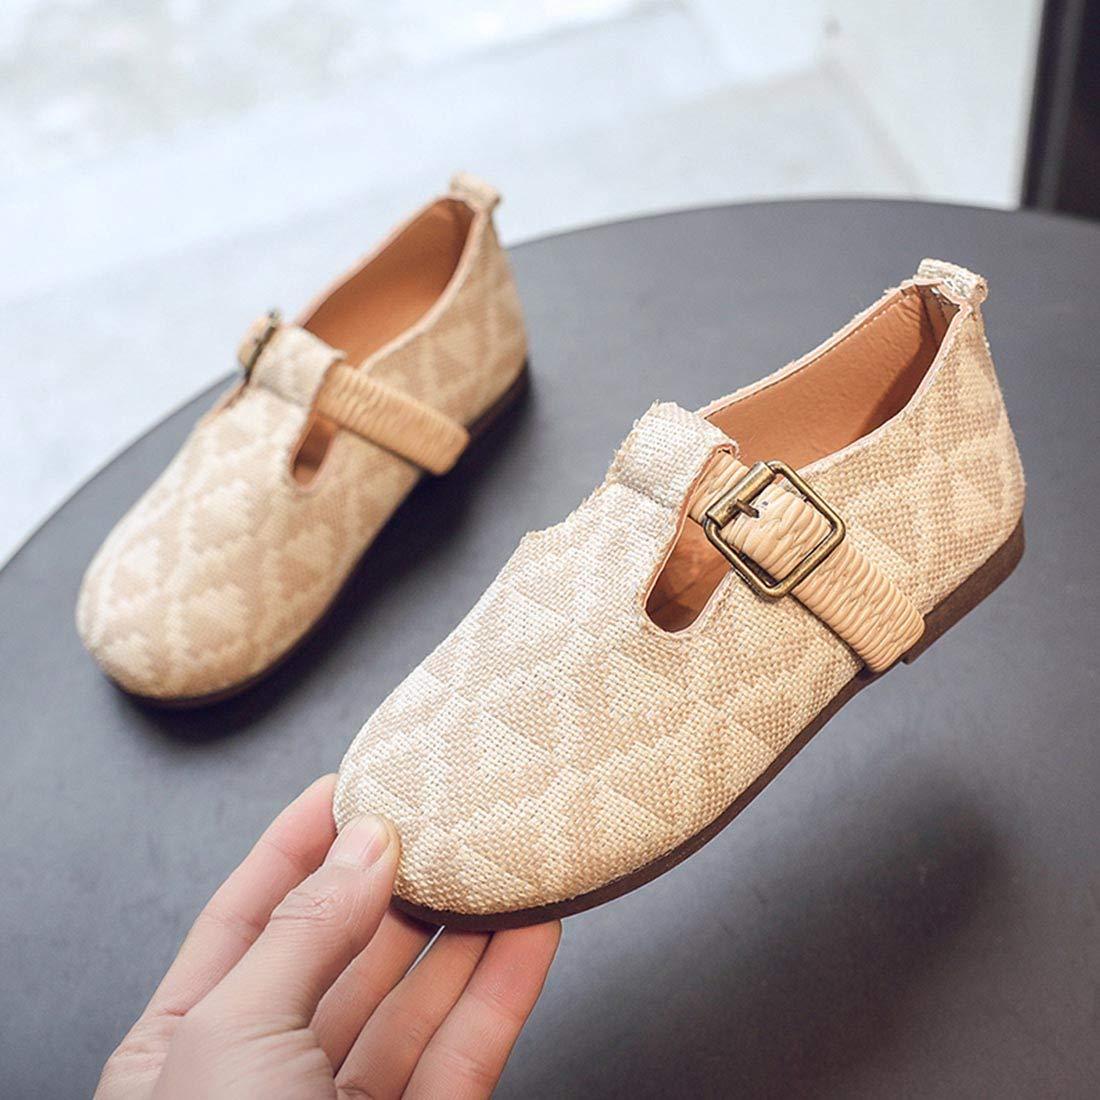 YIBLBOX Toddler Little Girls Slip On Mary Jane Ballet Flats Kids Princess Dress Shoes